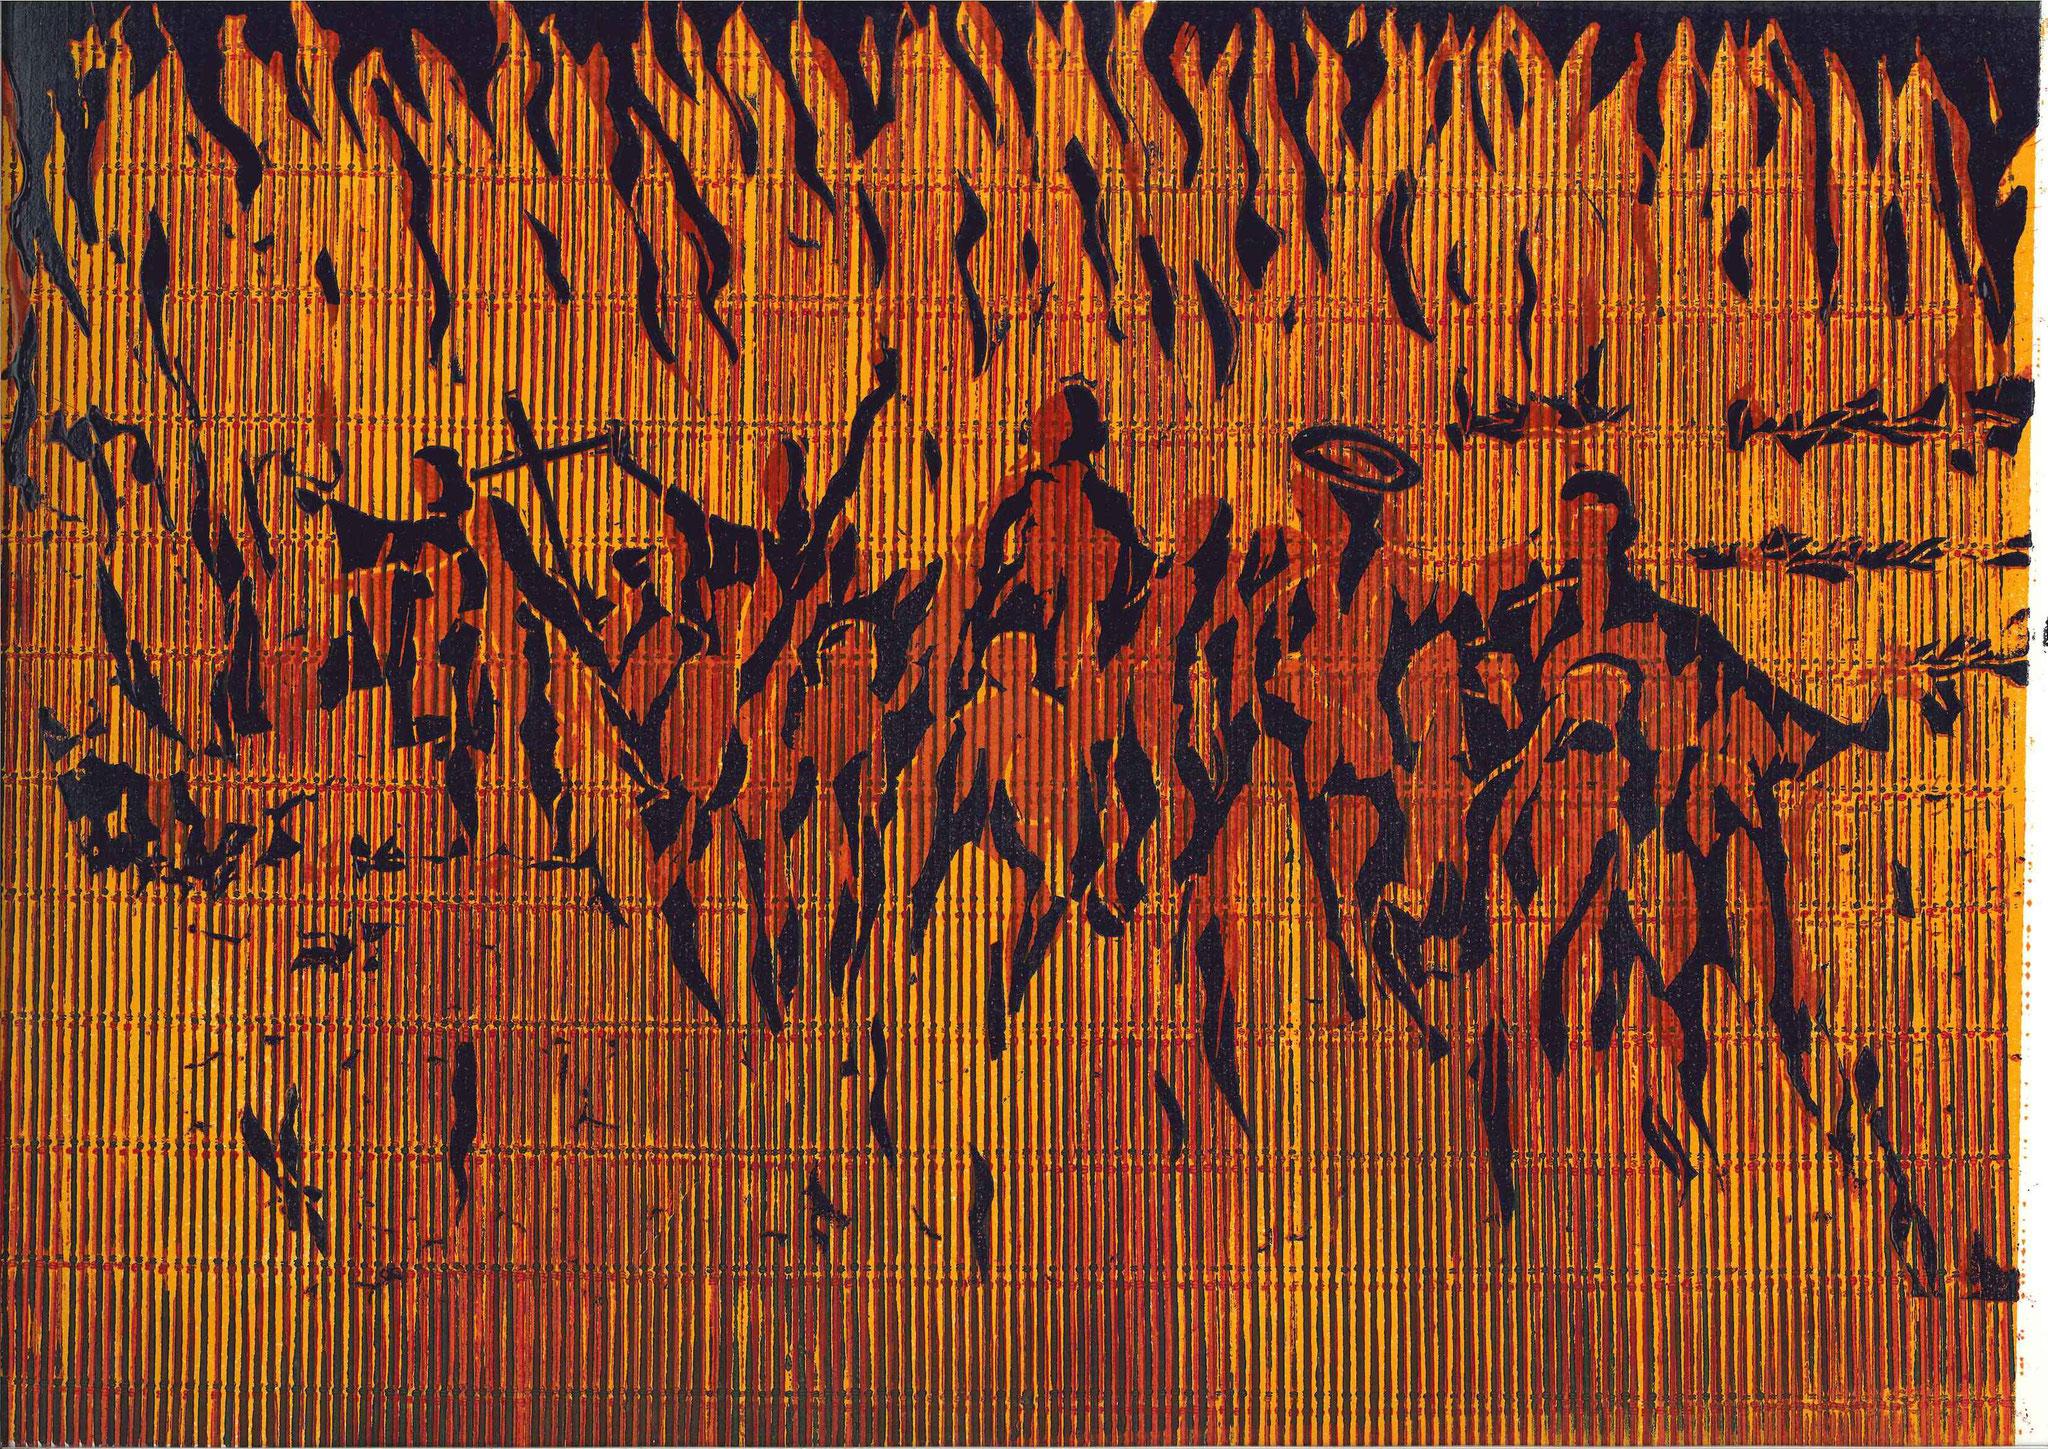 """le bùcher des cathatares"" 60x45cm Holzschnitt (verlorene Platte)"